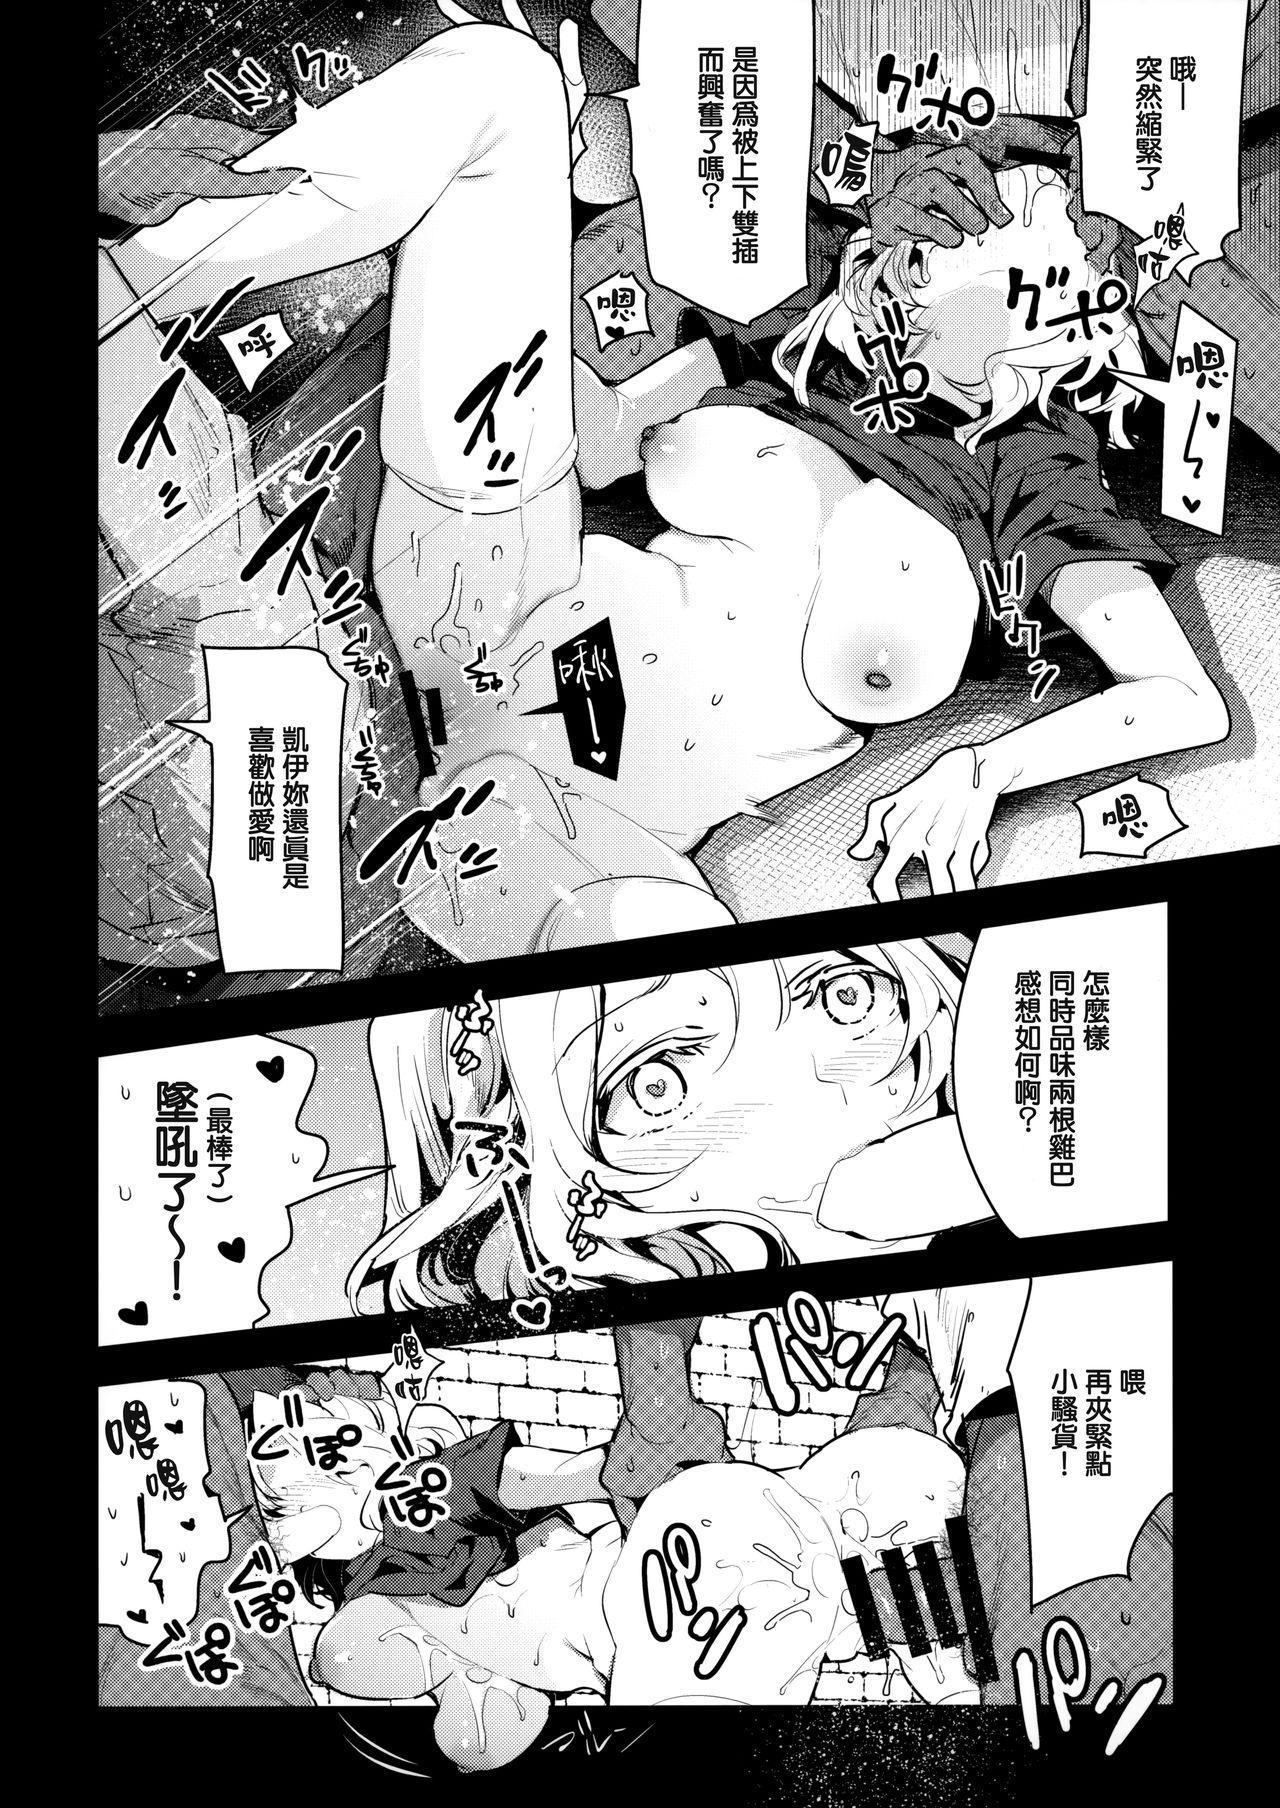 GirlPan Rakugakichou 7 18